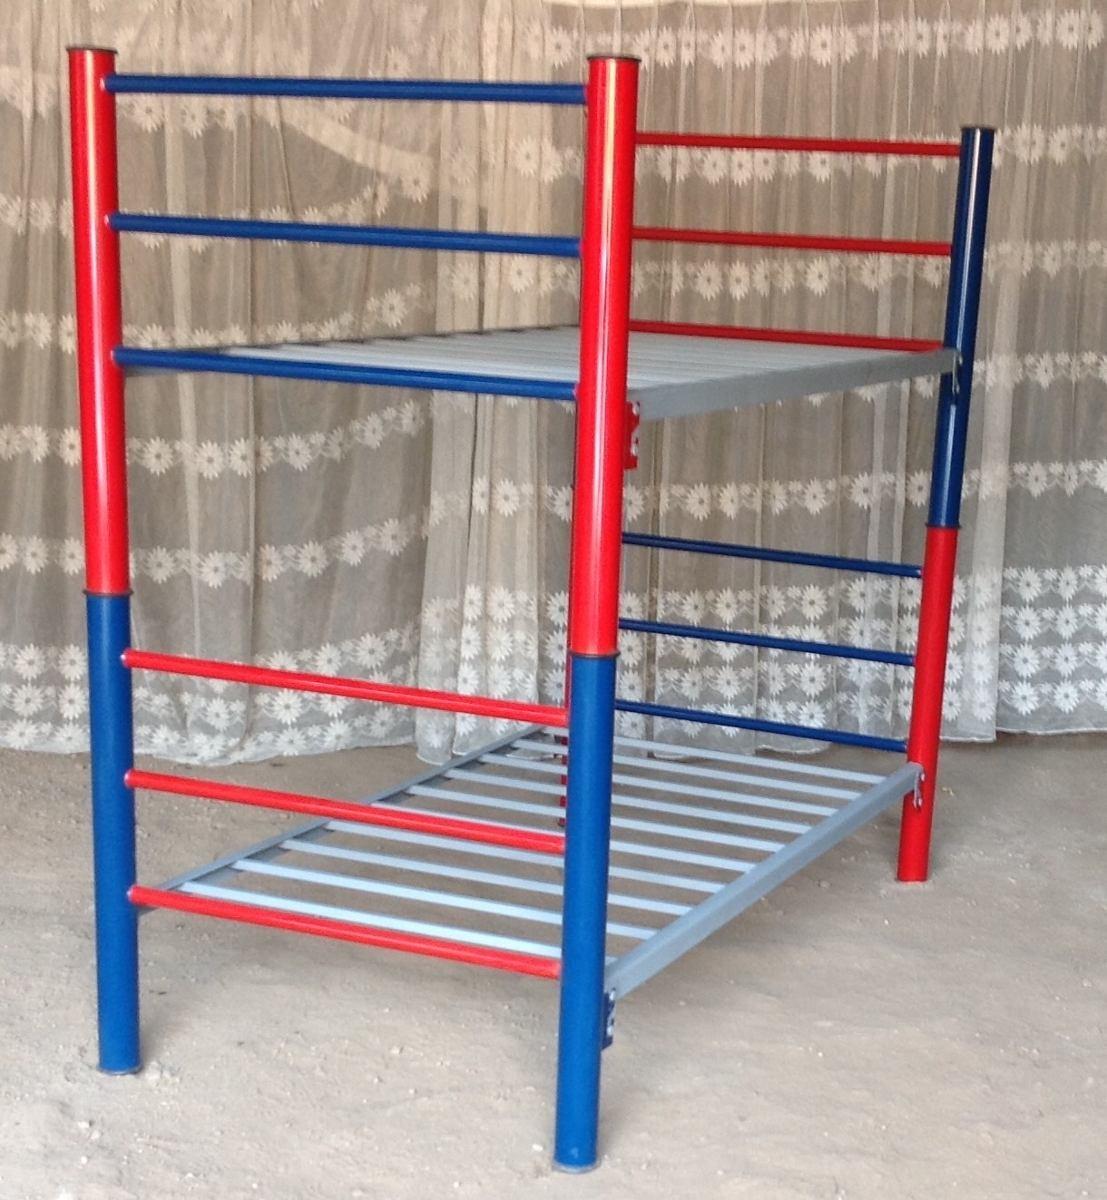 Muebles Tubulares Nazaret 1 900 00 En Mercado Libre # Muebles Nazaret